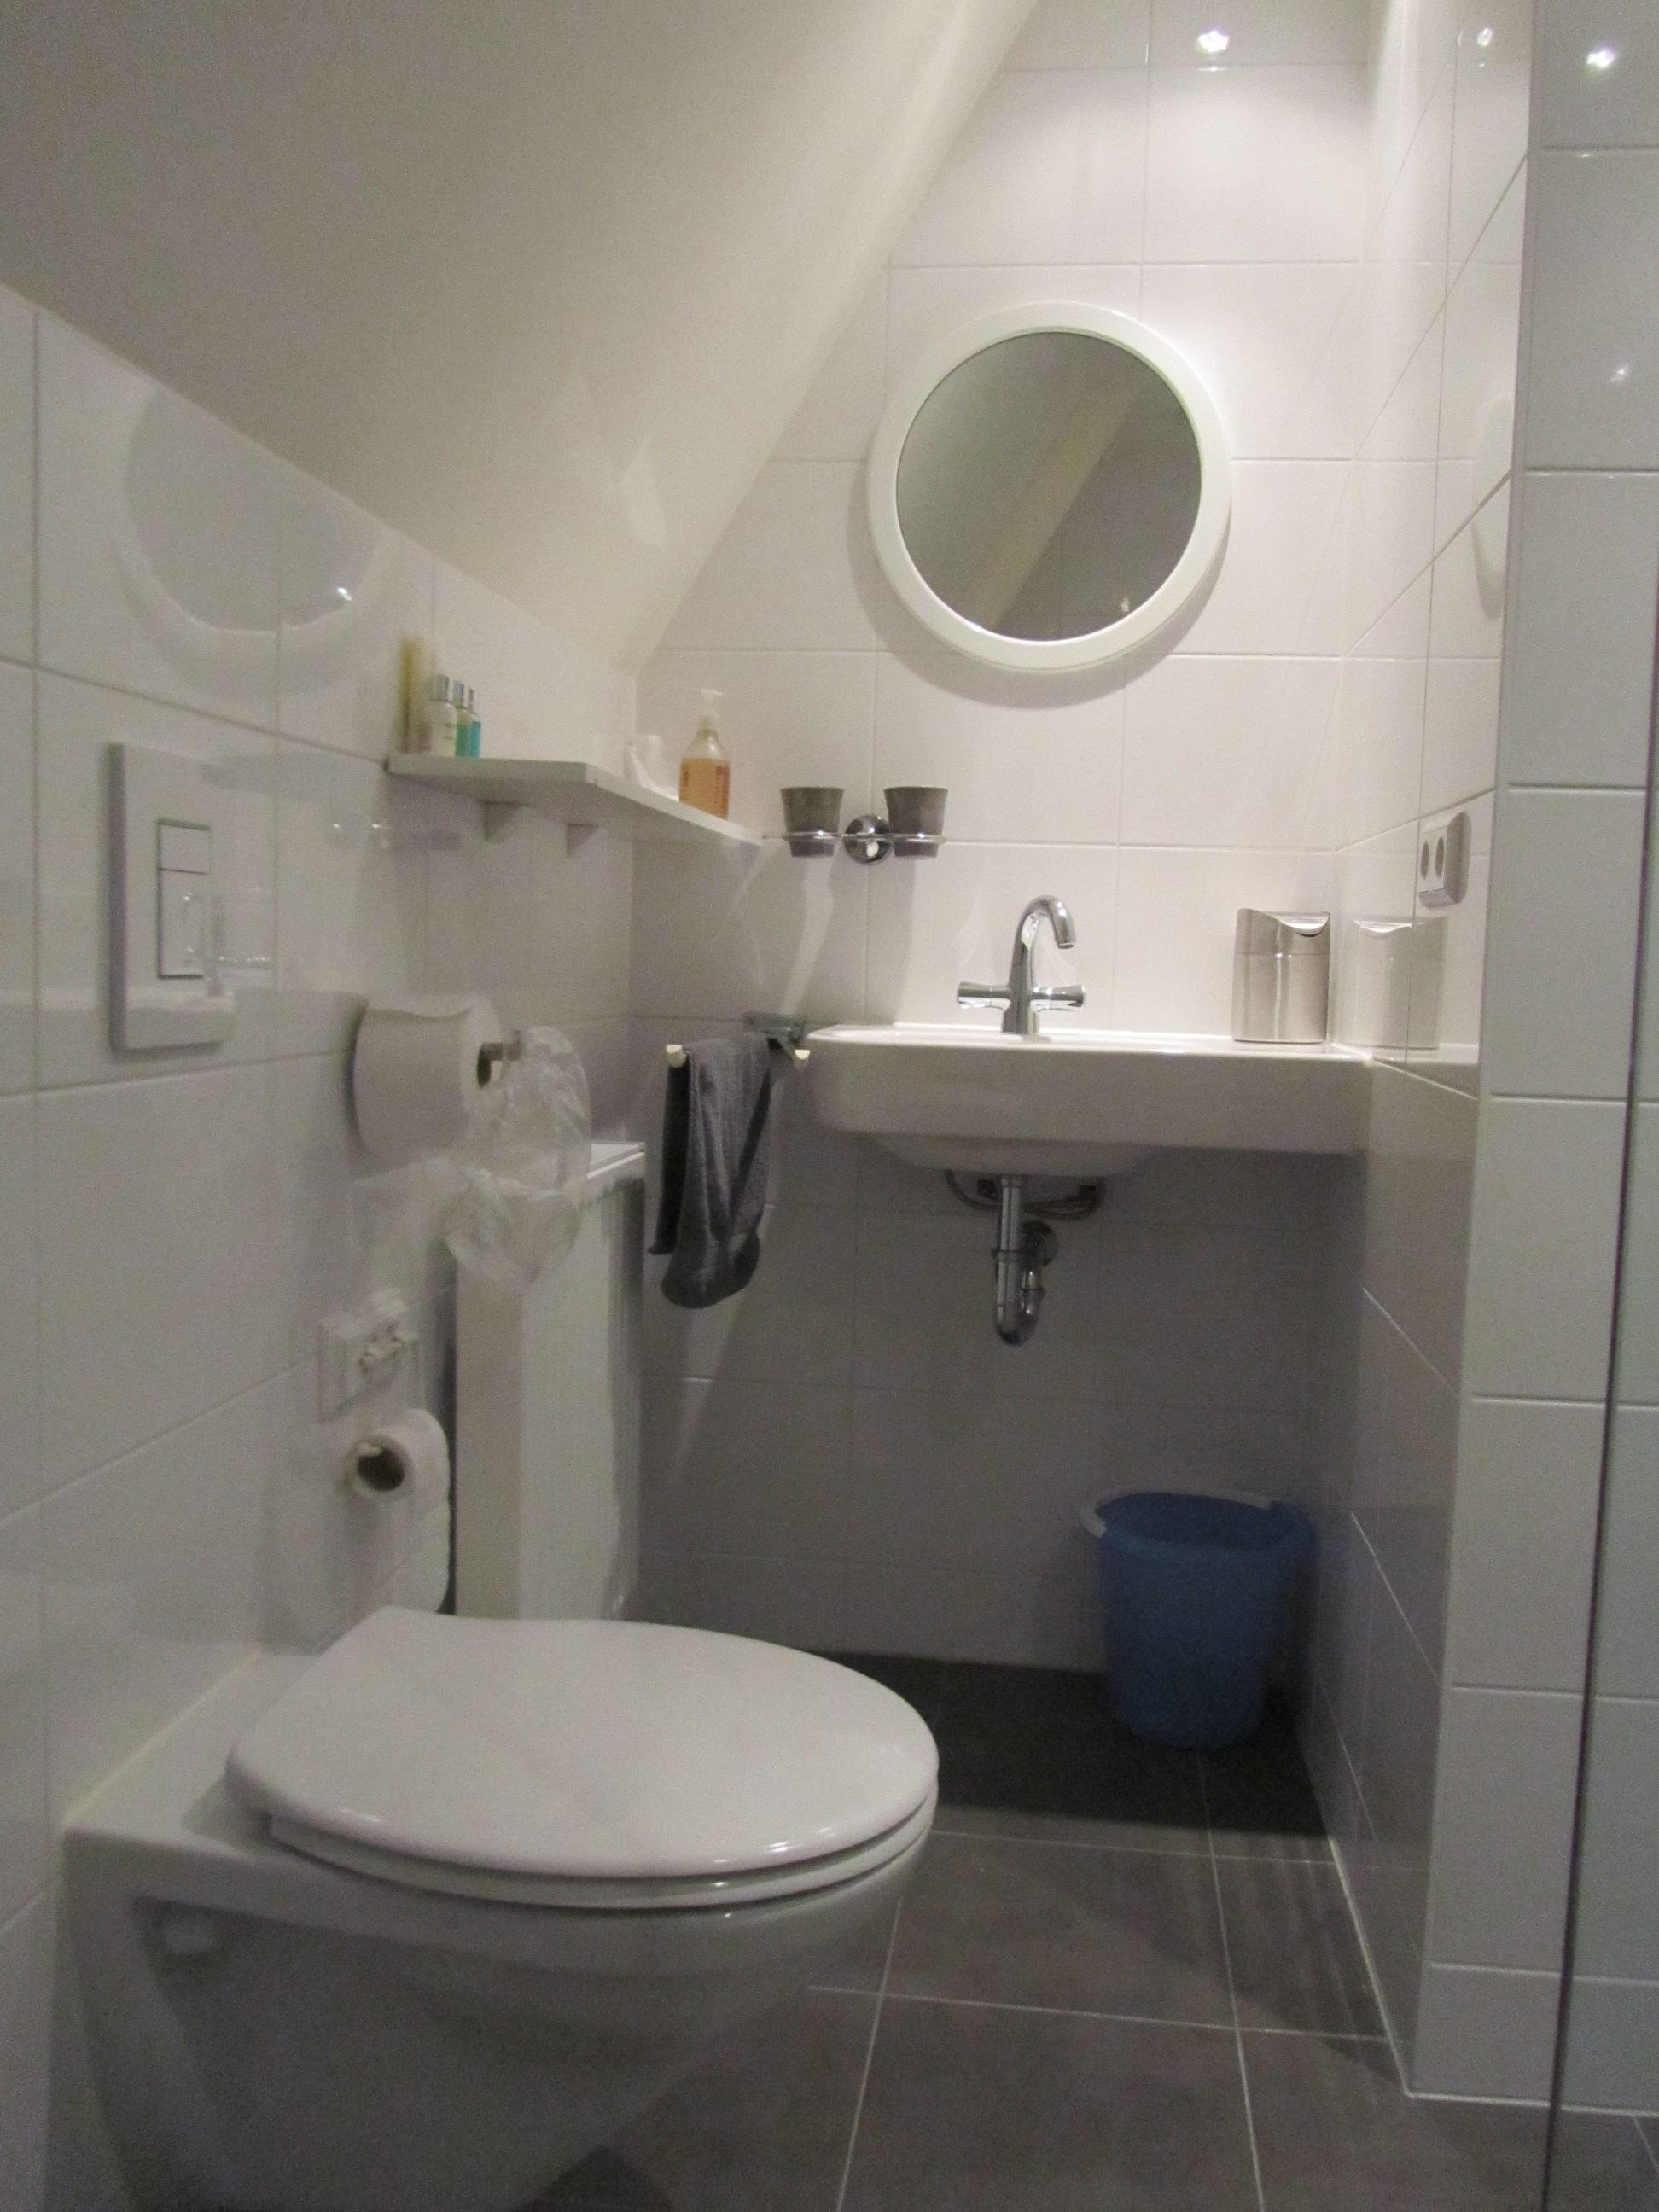 18e badkamer 3 nieuw | RR Bouwadvies